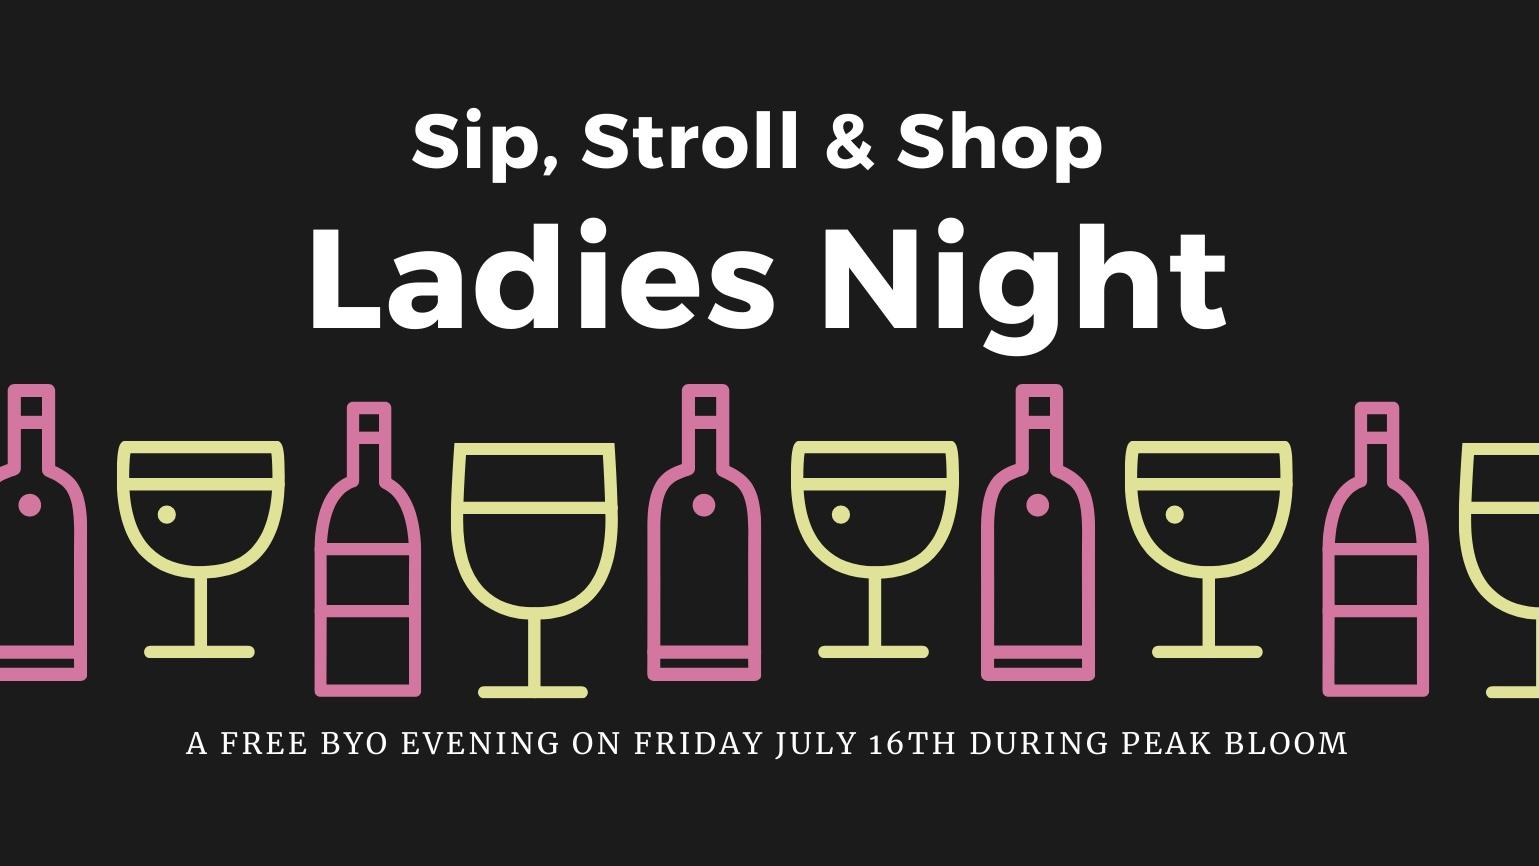 Sip, Stroll, & Shop Ladies Night